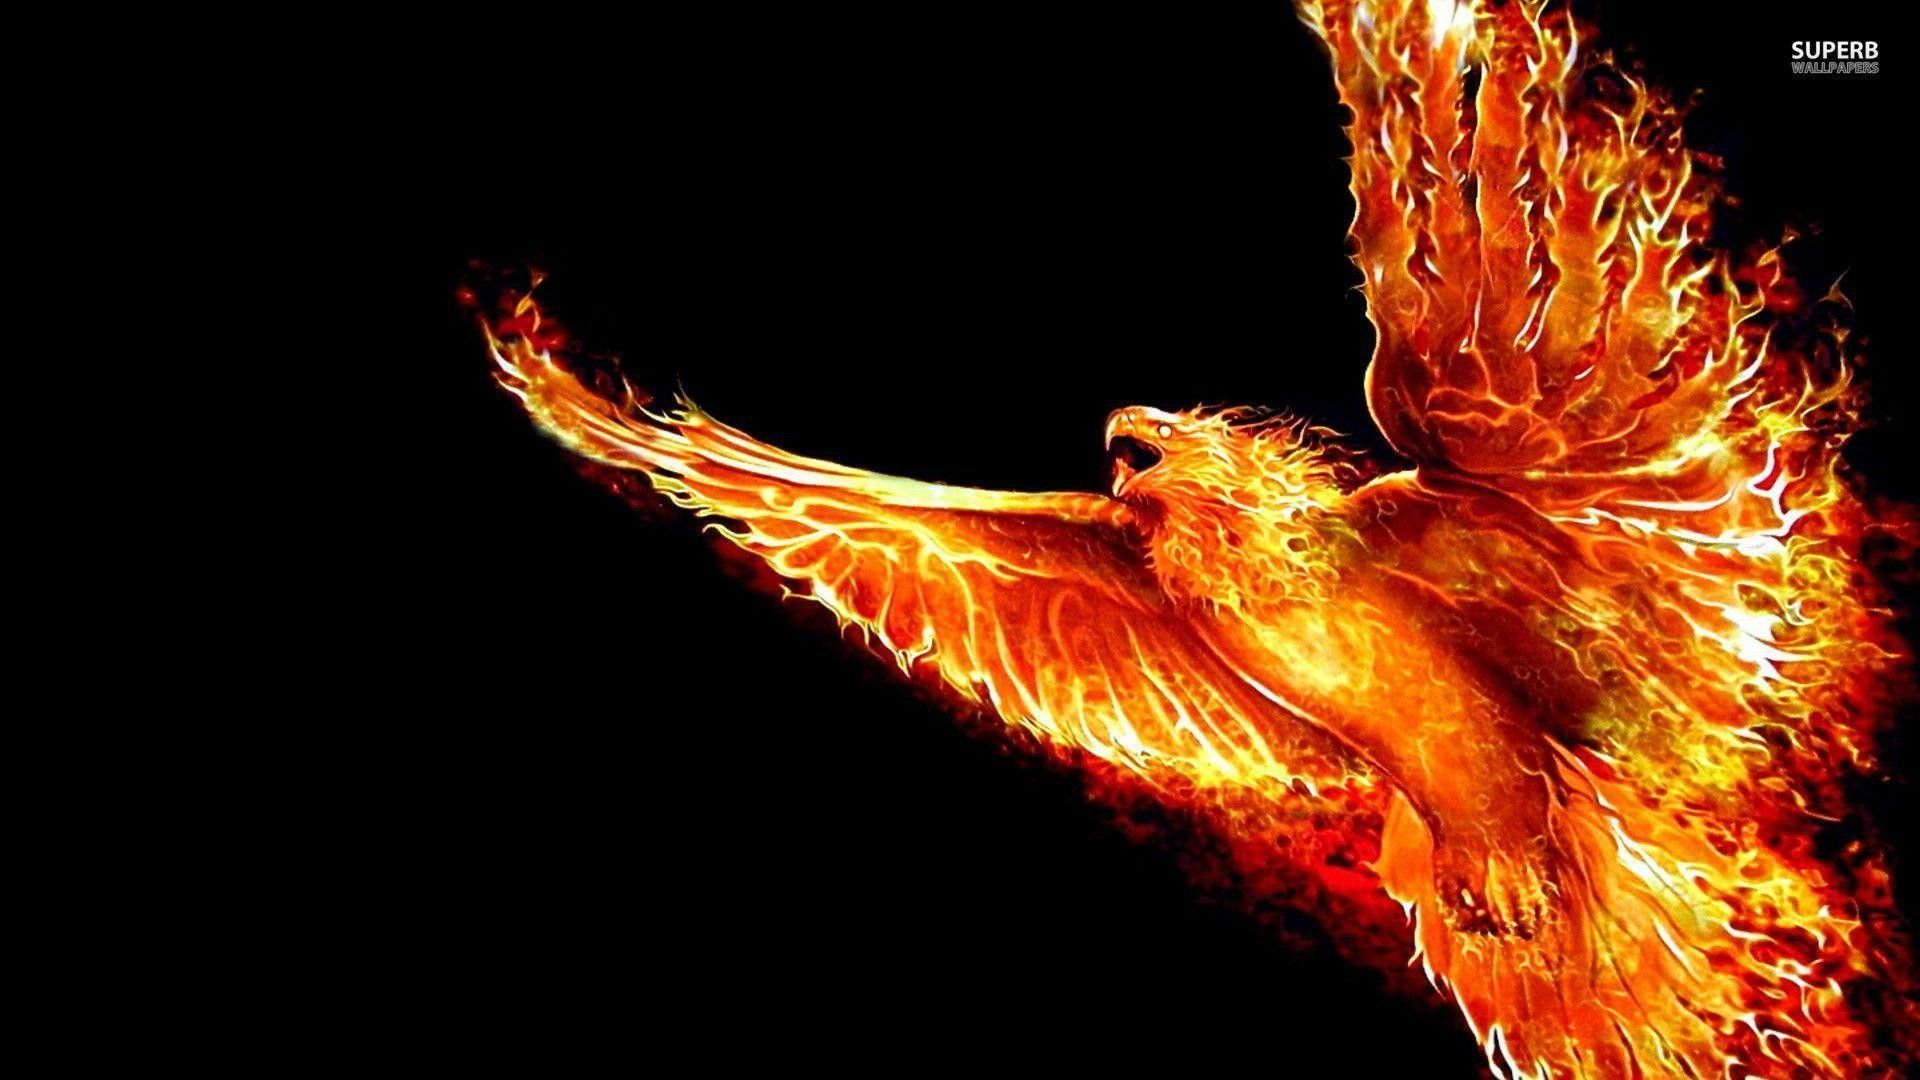 Hd Phoenix Wallpapers Top Free Hd Phoenix Backgrounds